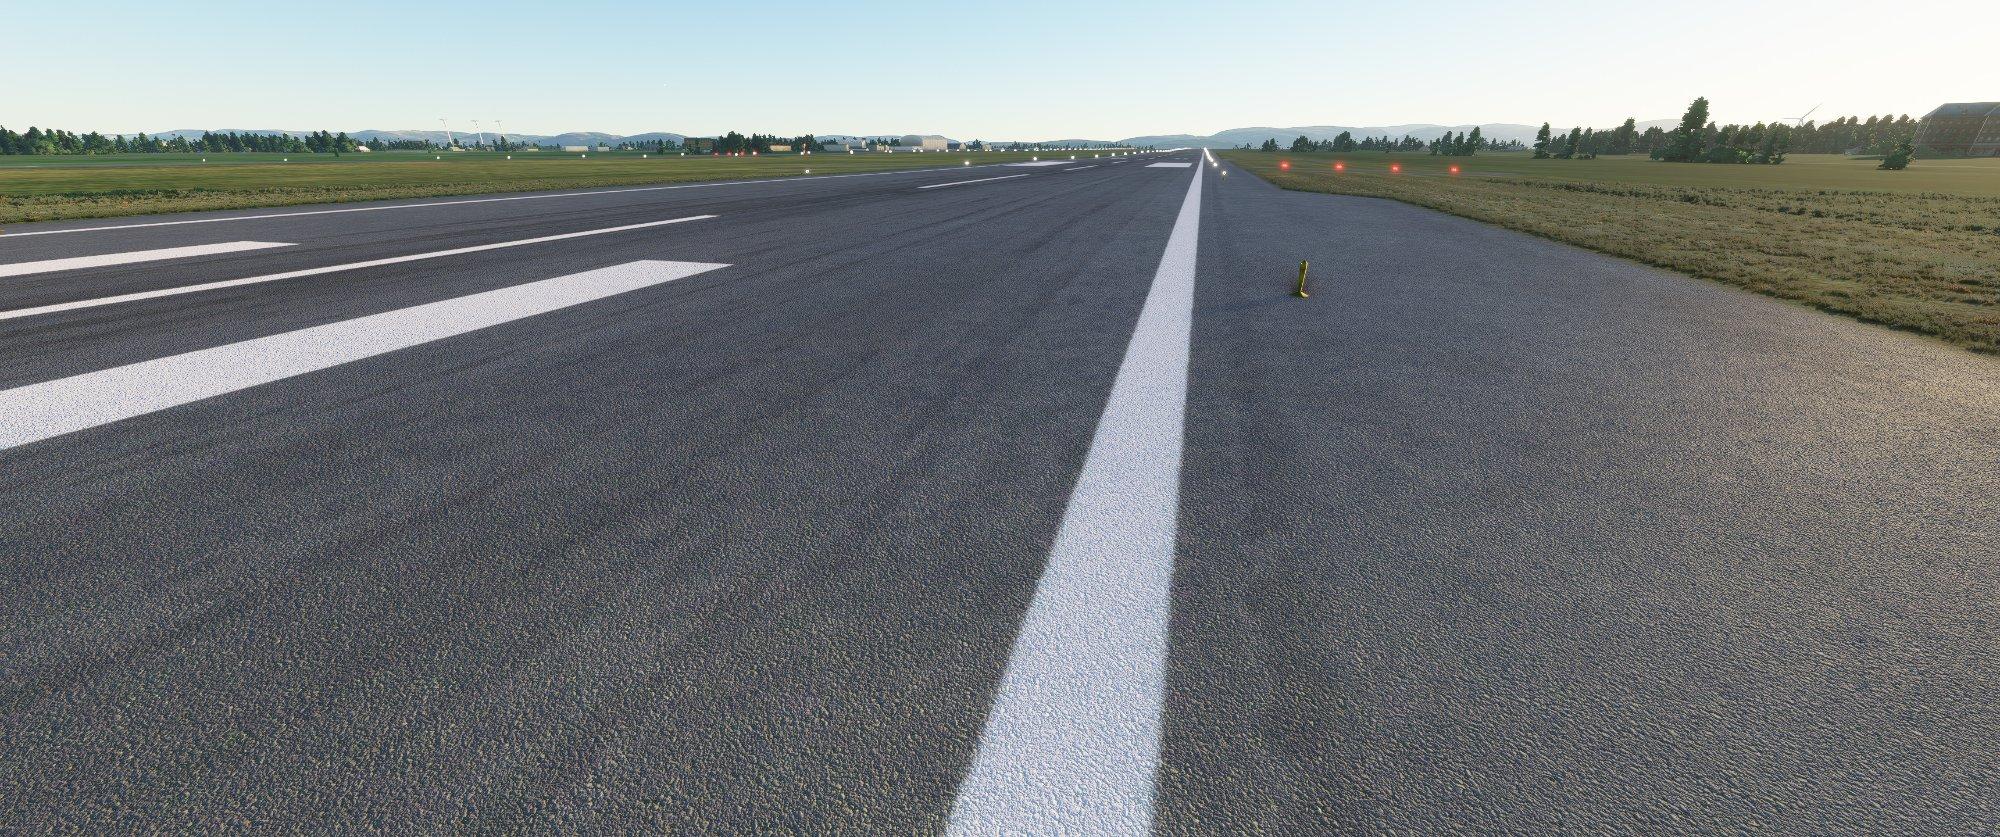 Microsoft Flight Simulator Screenshot 2020.11.09 - 17.40.55.03.jpg